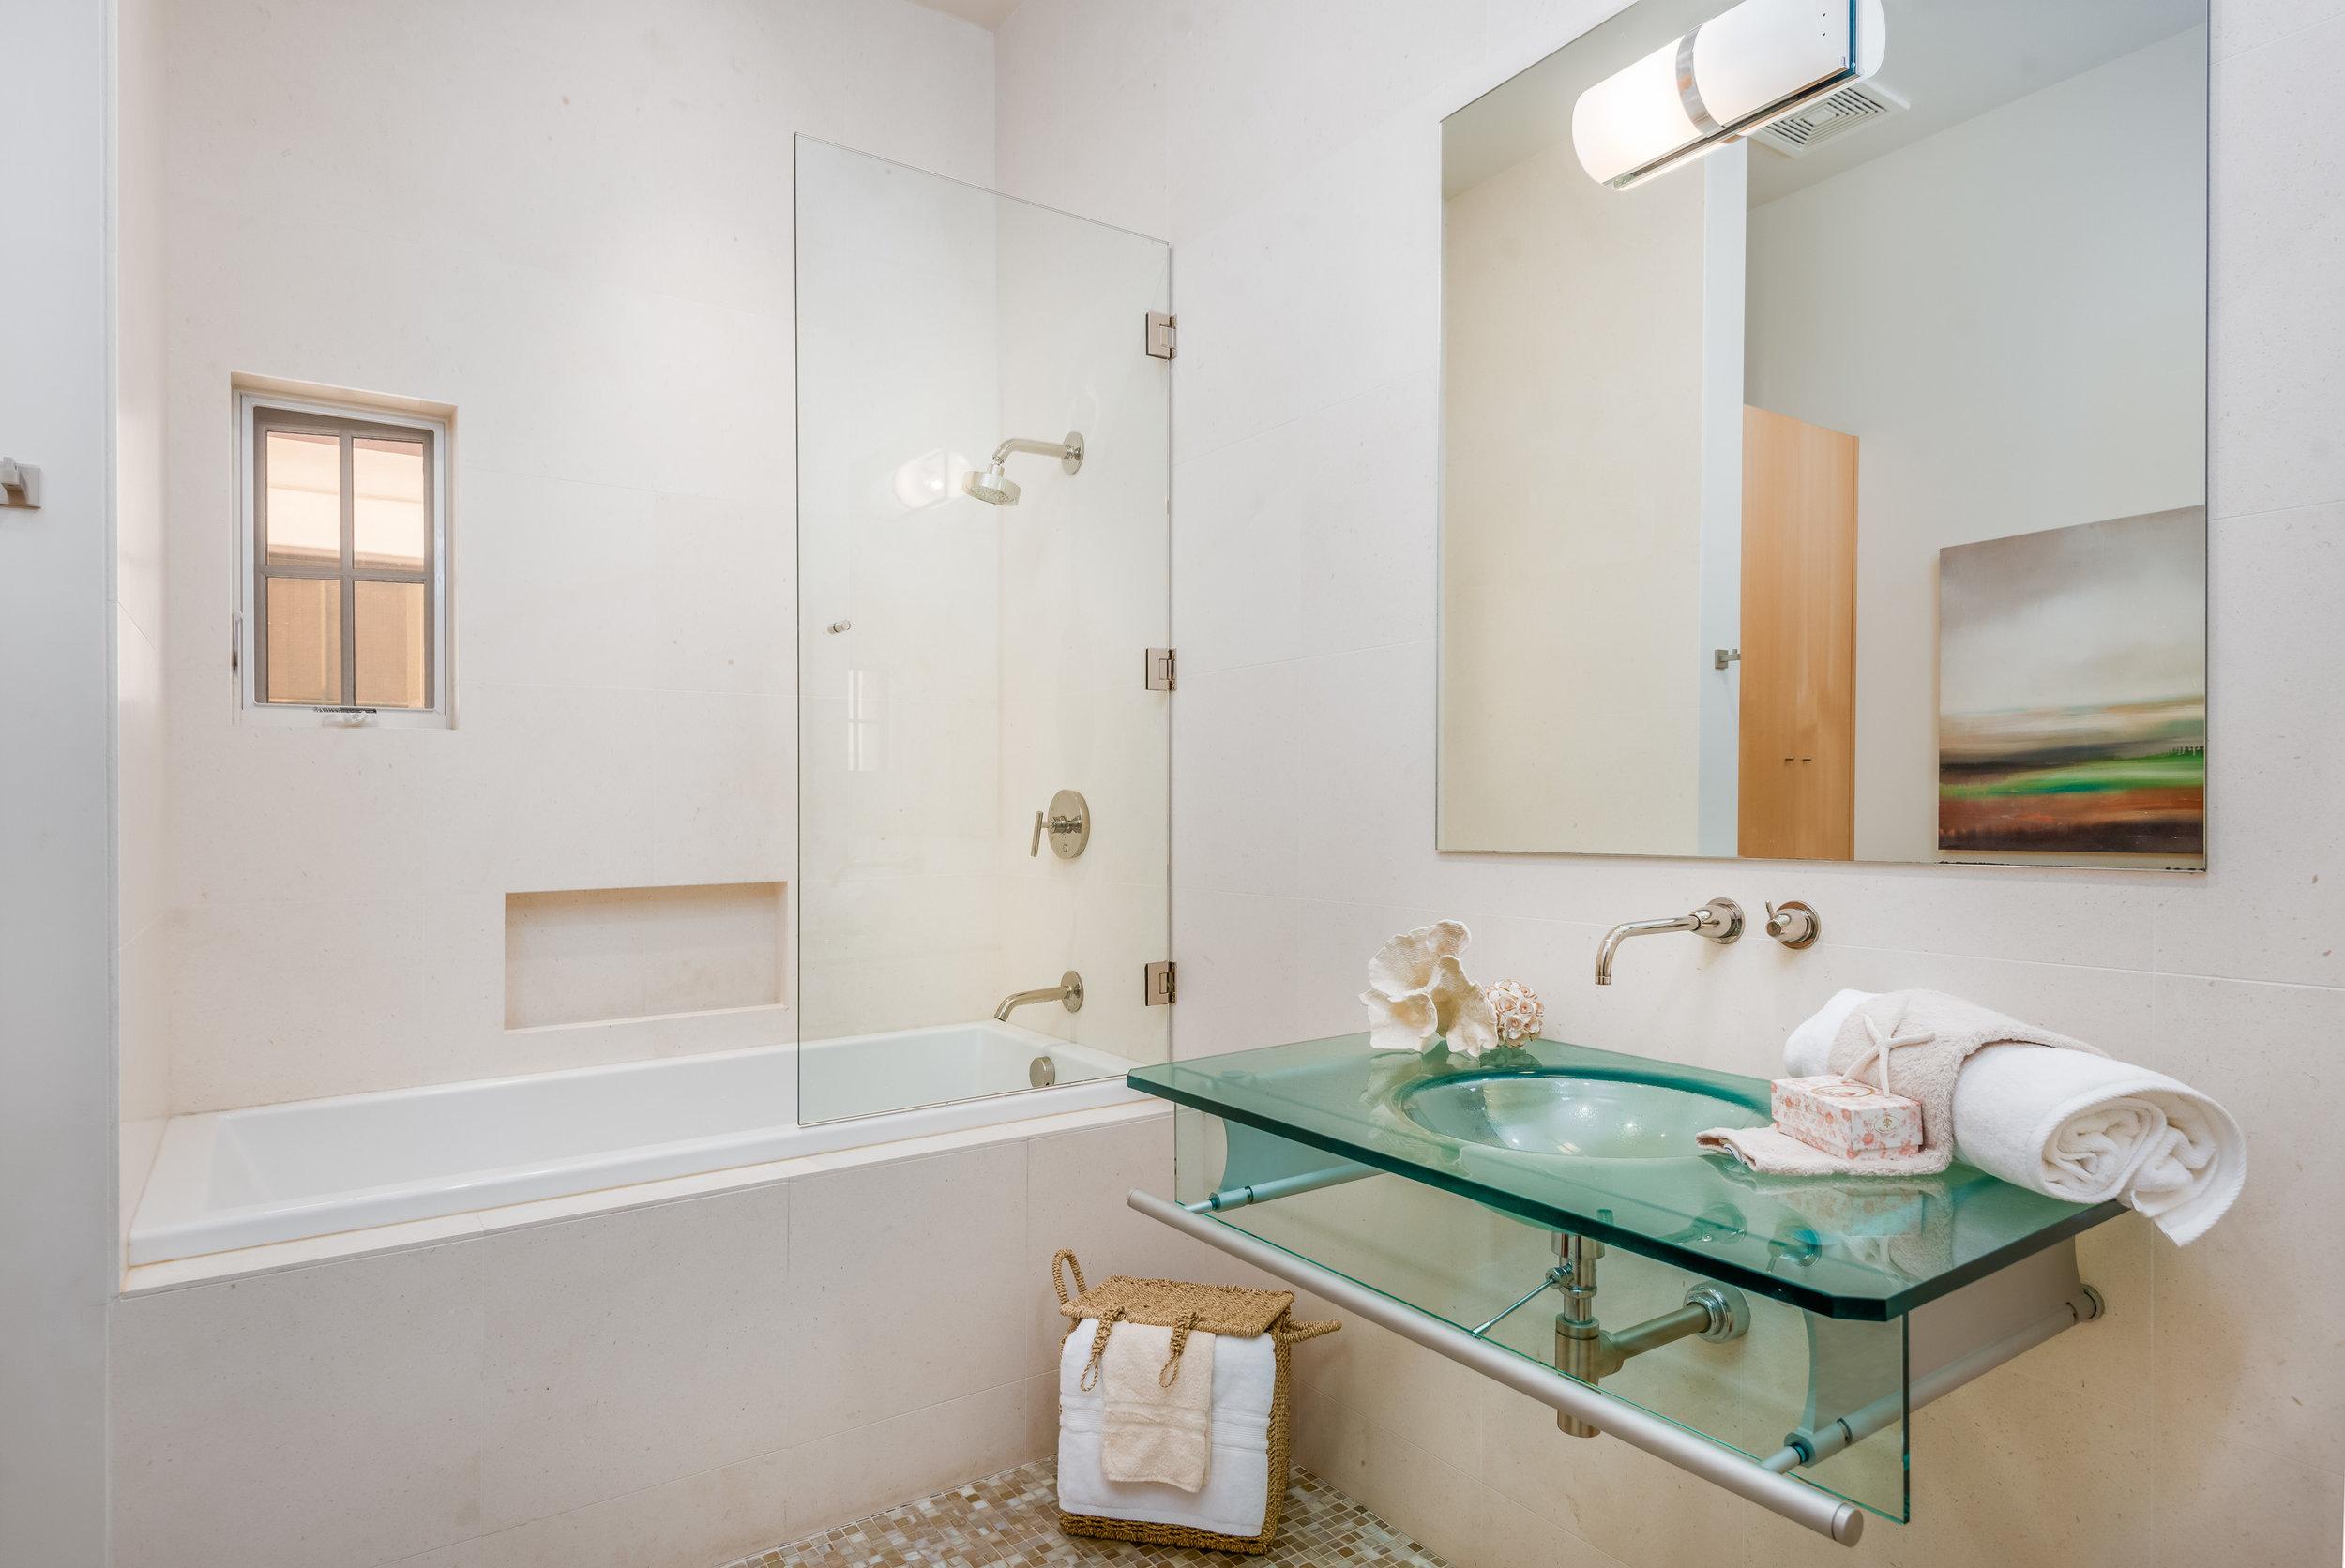 014_14-Bathroom 2.jpg